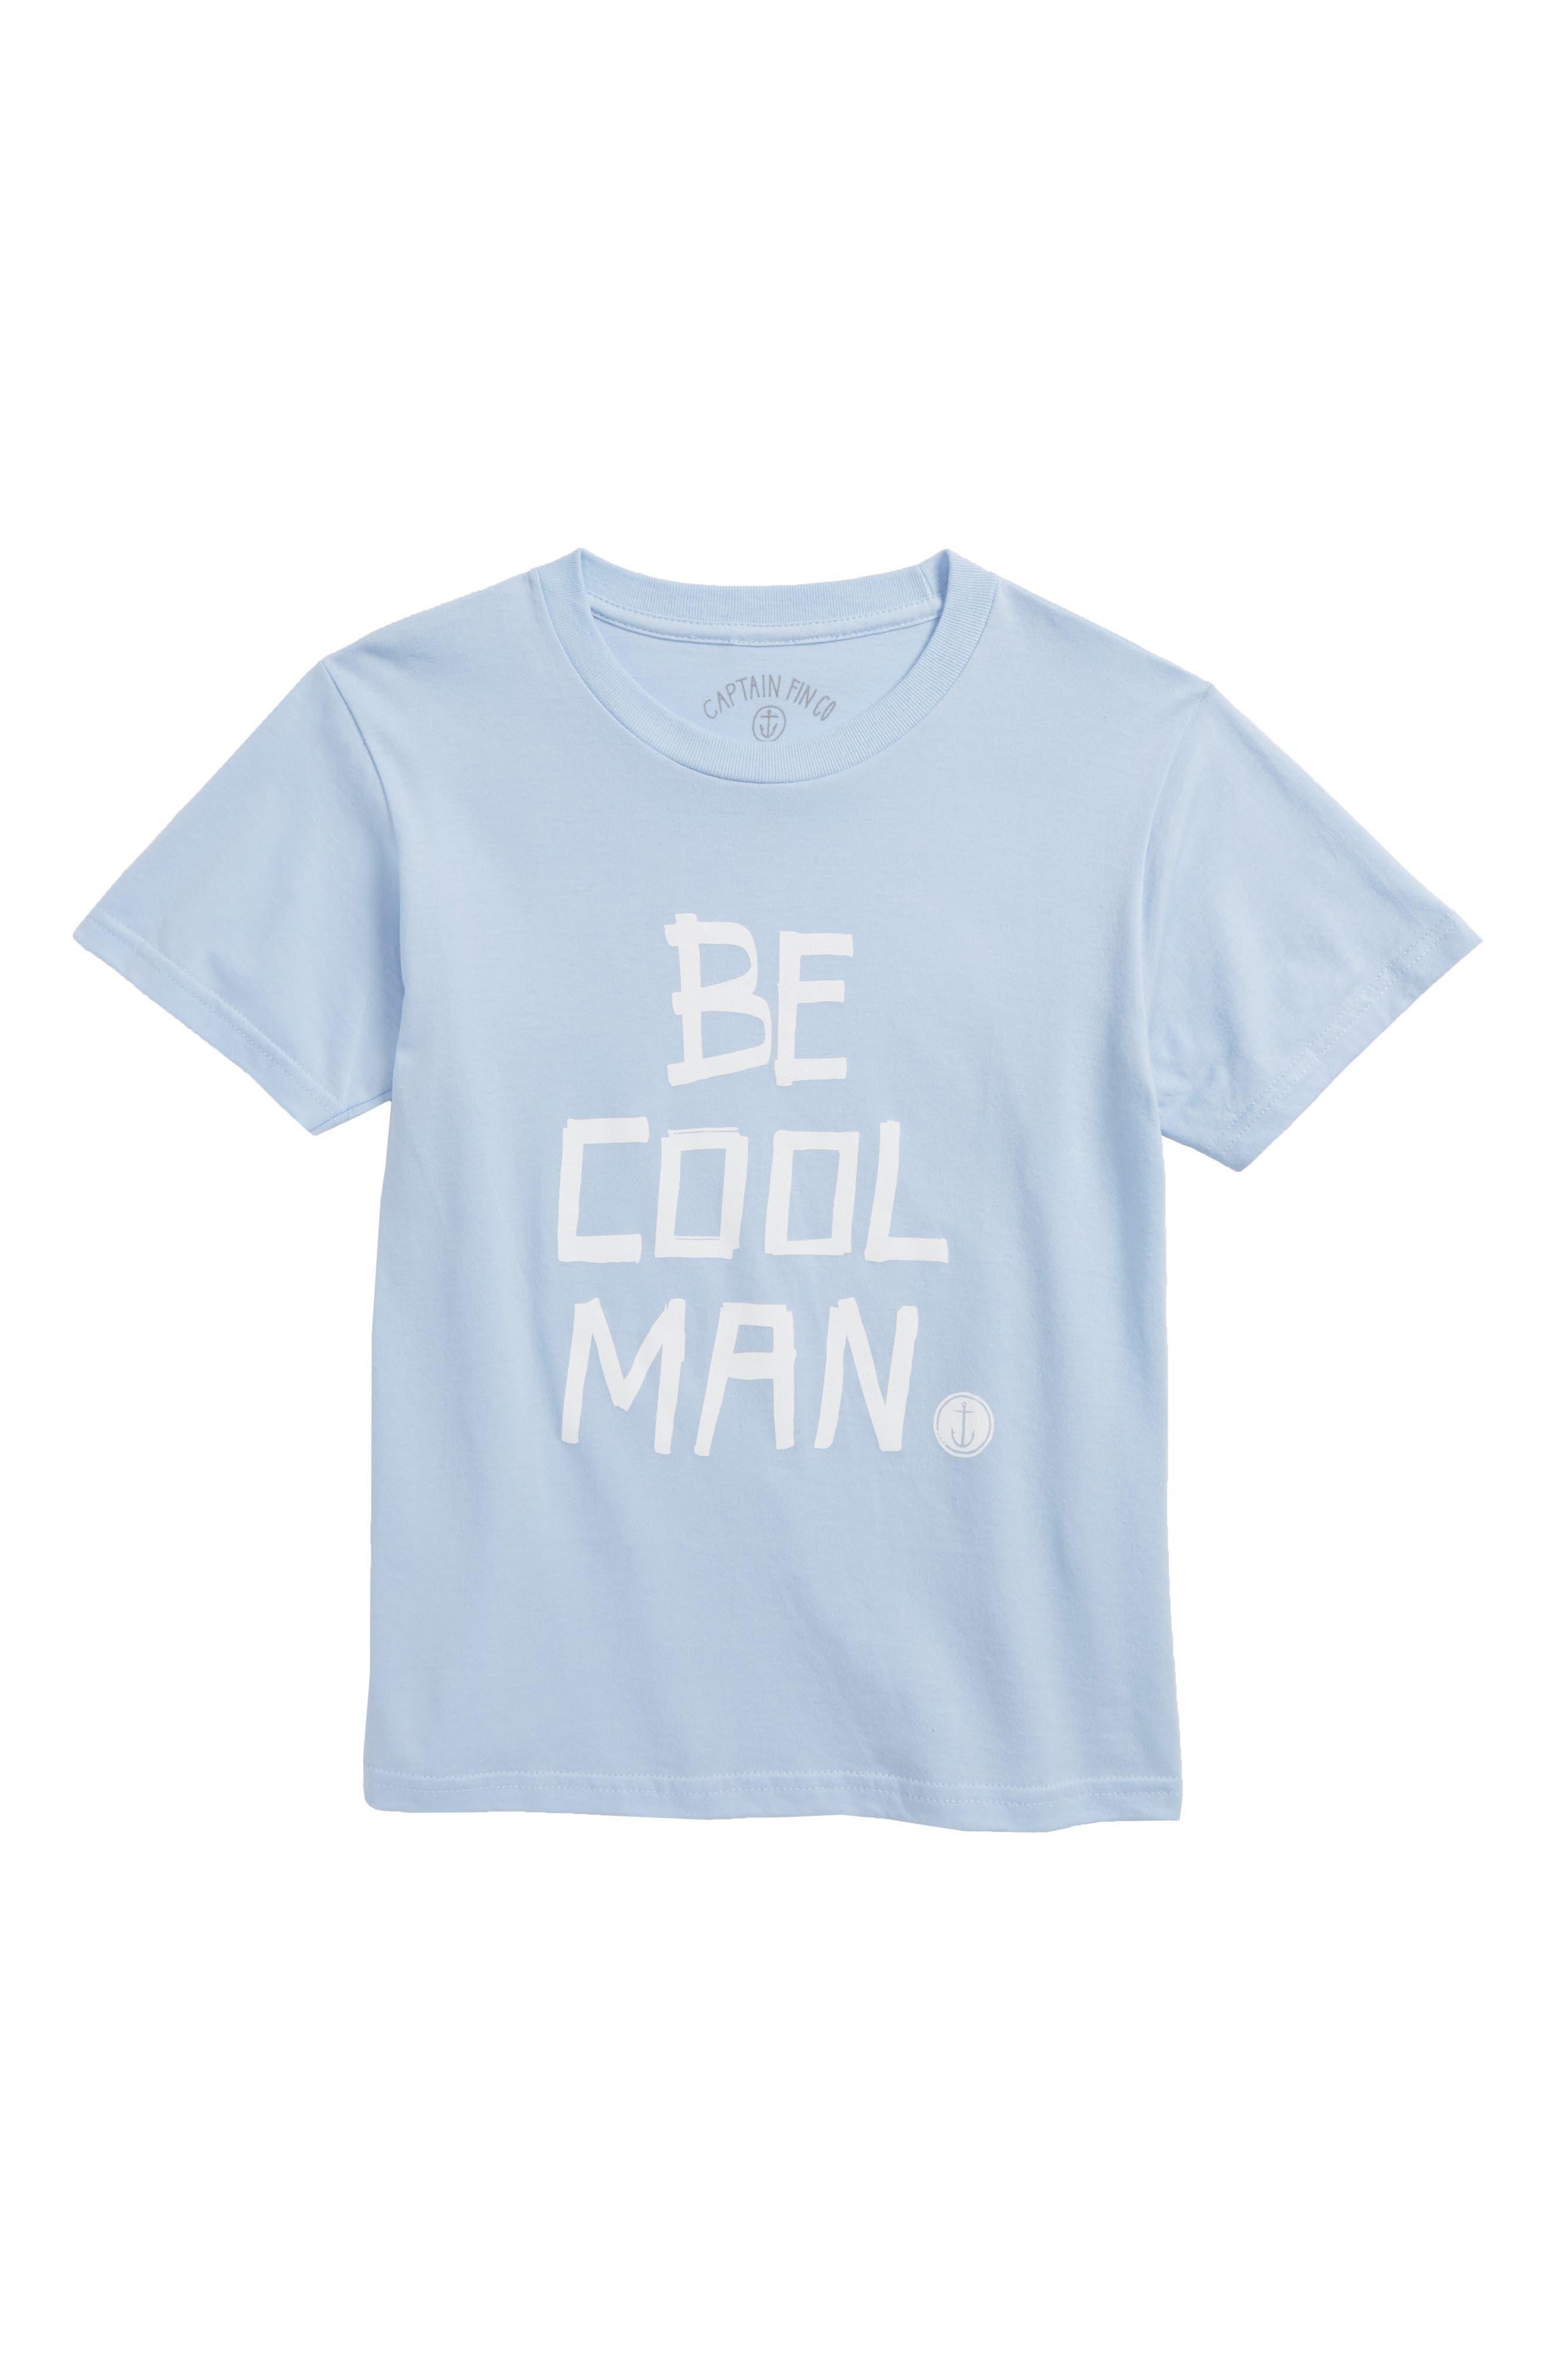 Captin Fin Be Cool Man Graphic T-Shirt,                         Main,                         color, 450